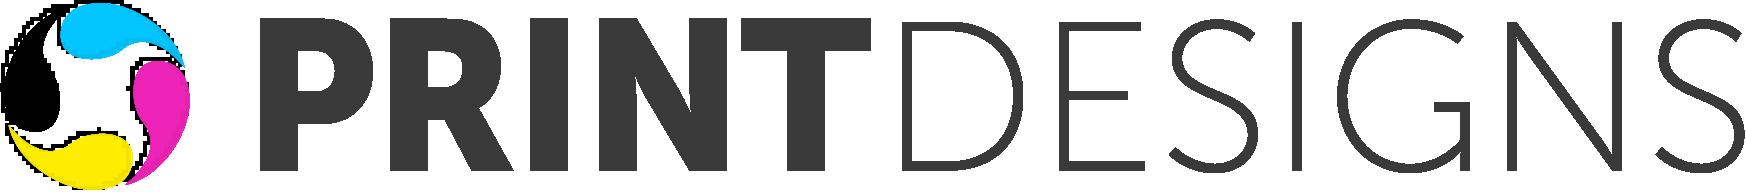 printdesigns logo